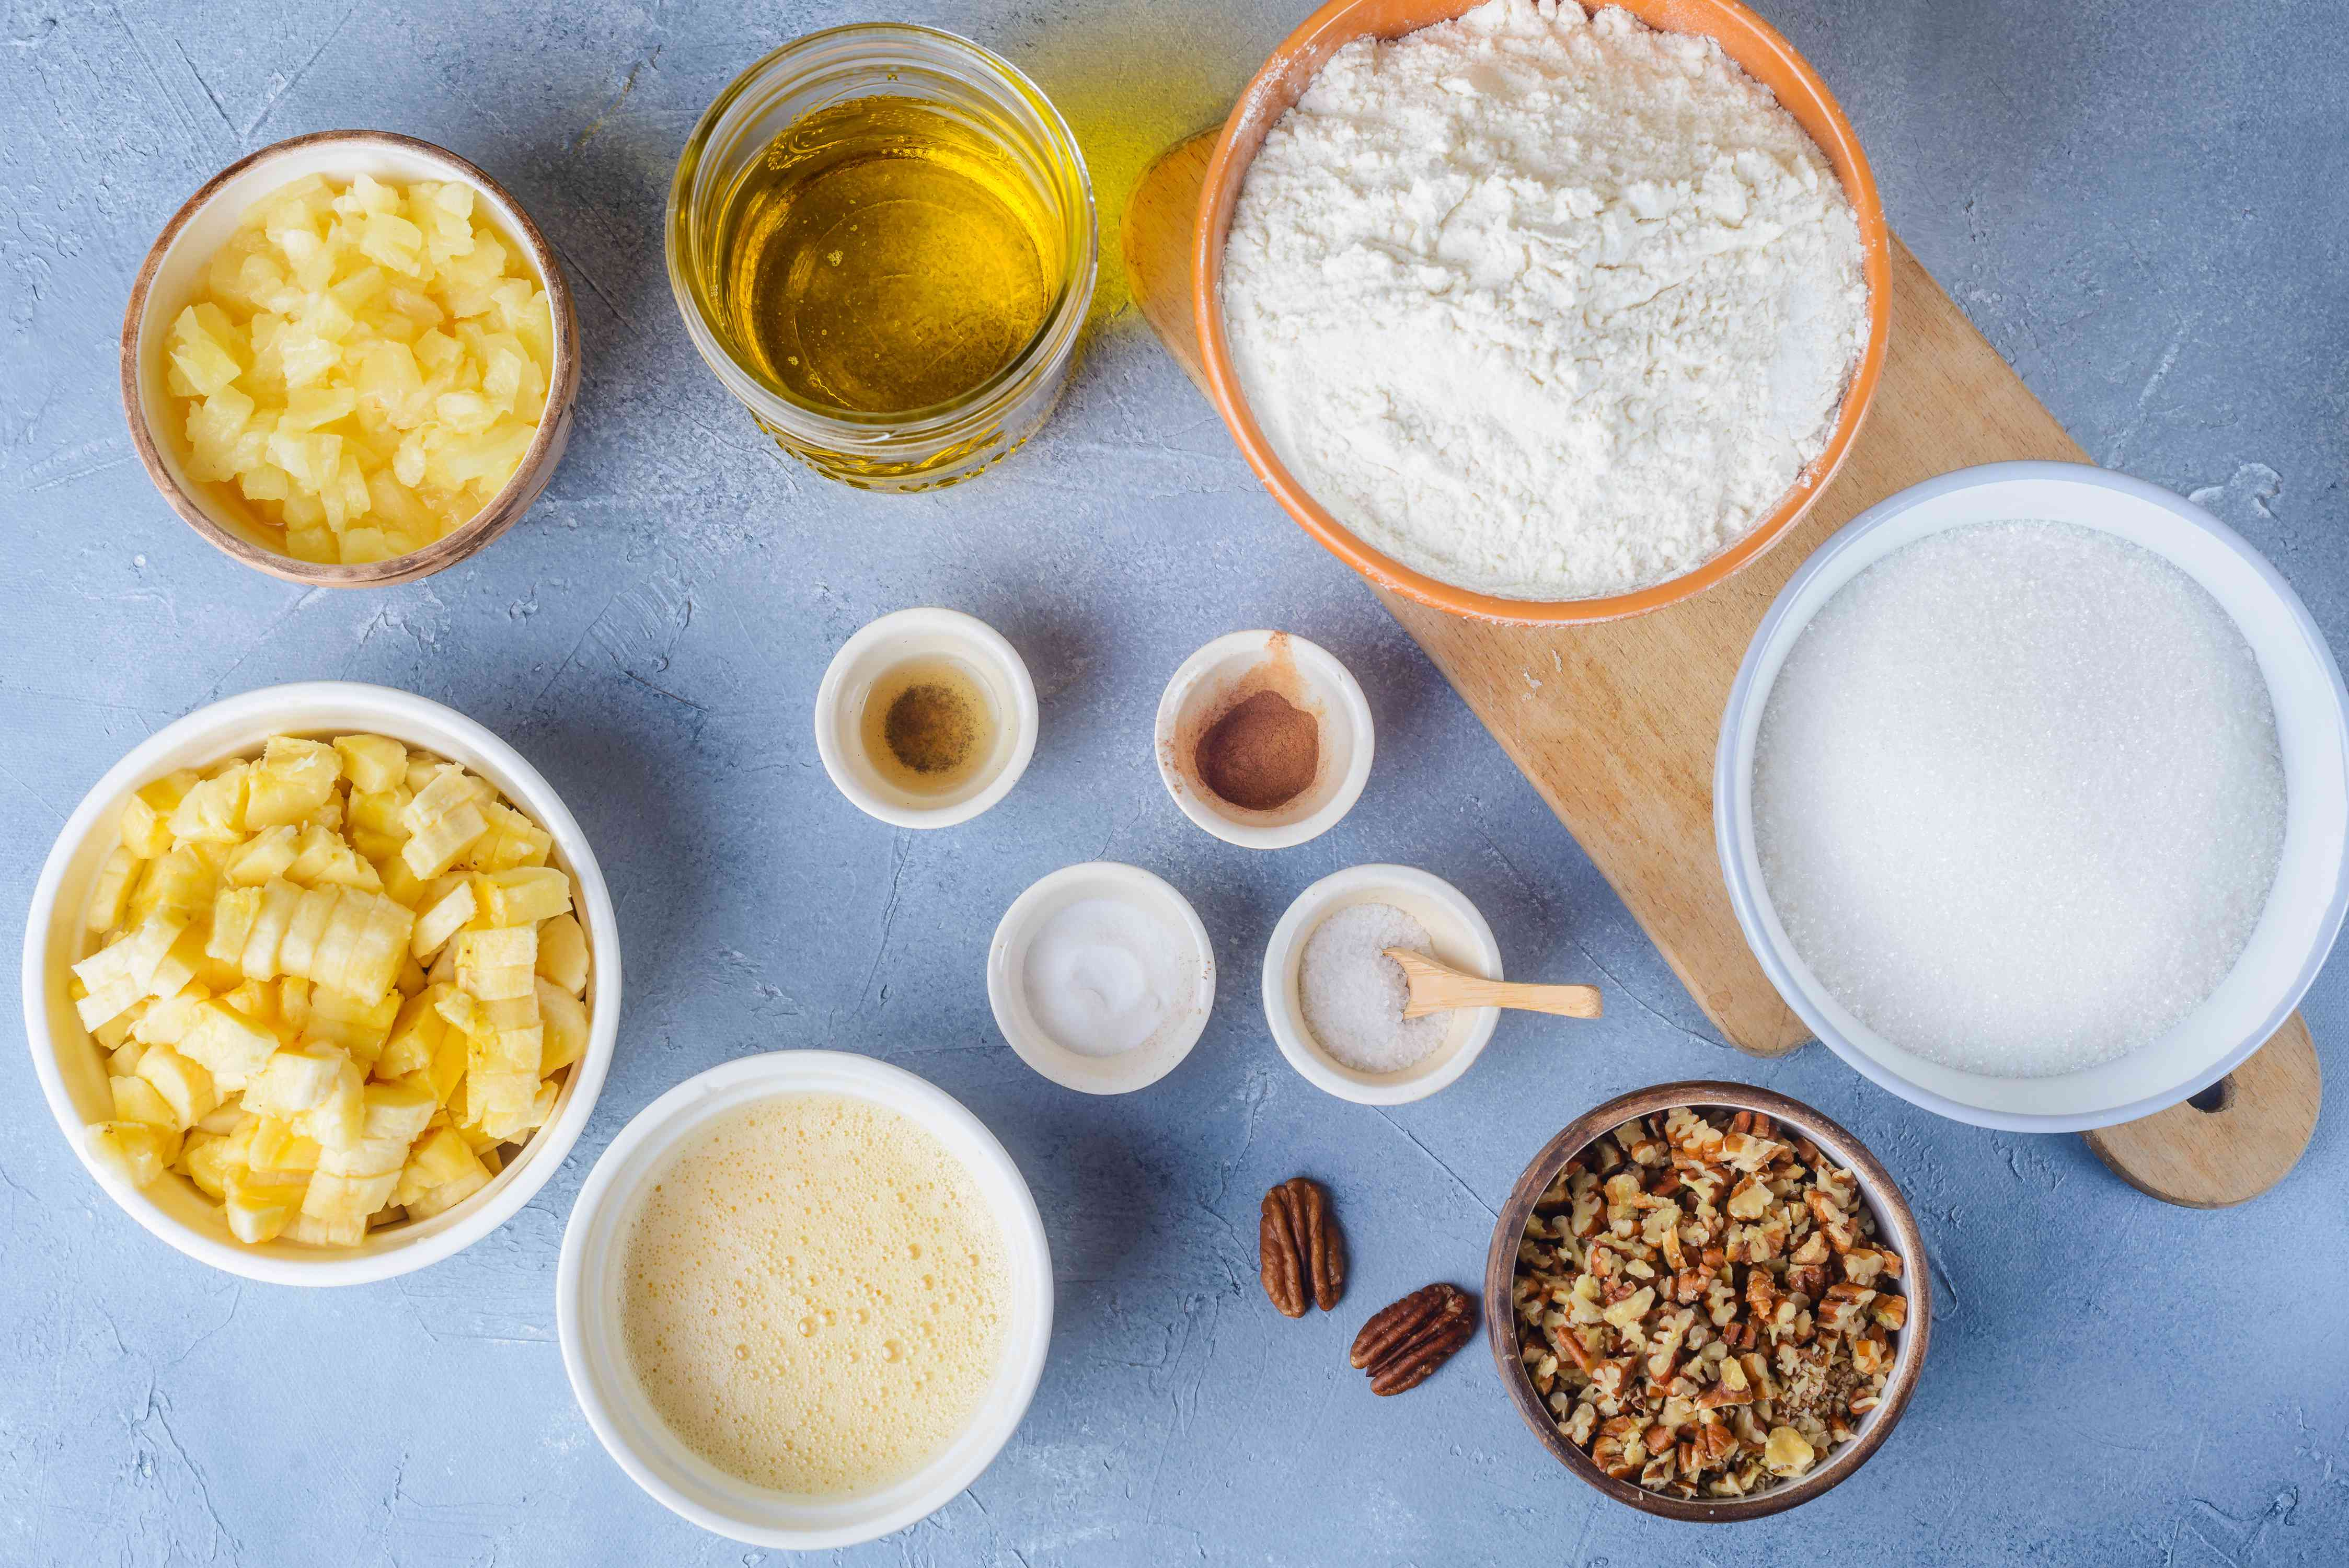 Ingredients for classic hummingbird cake